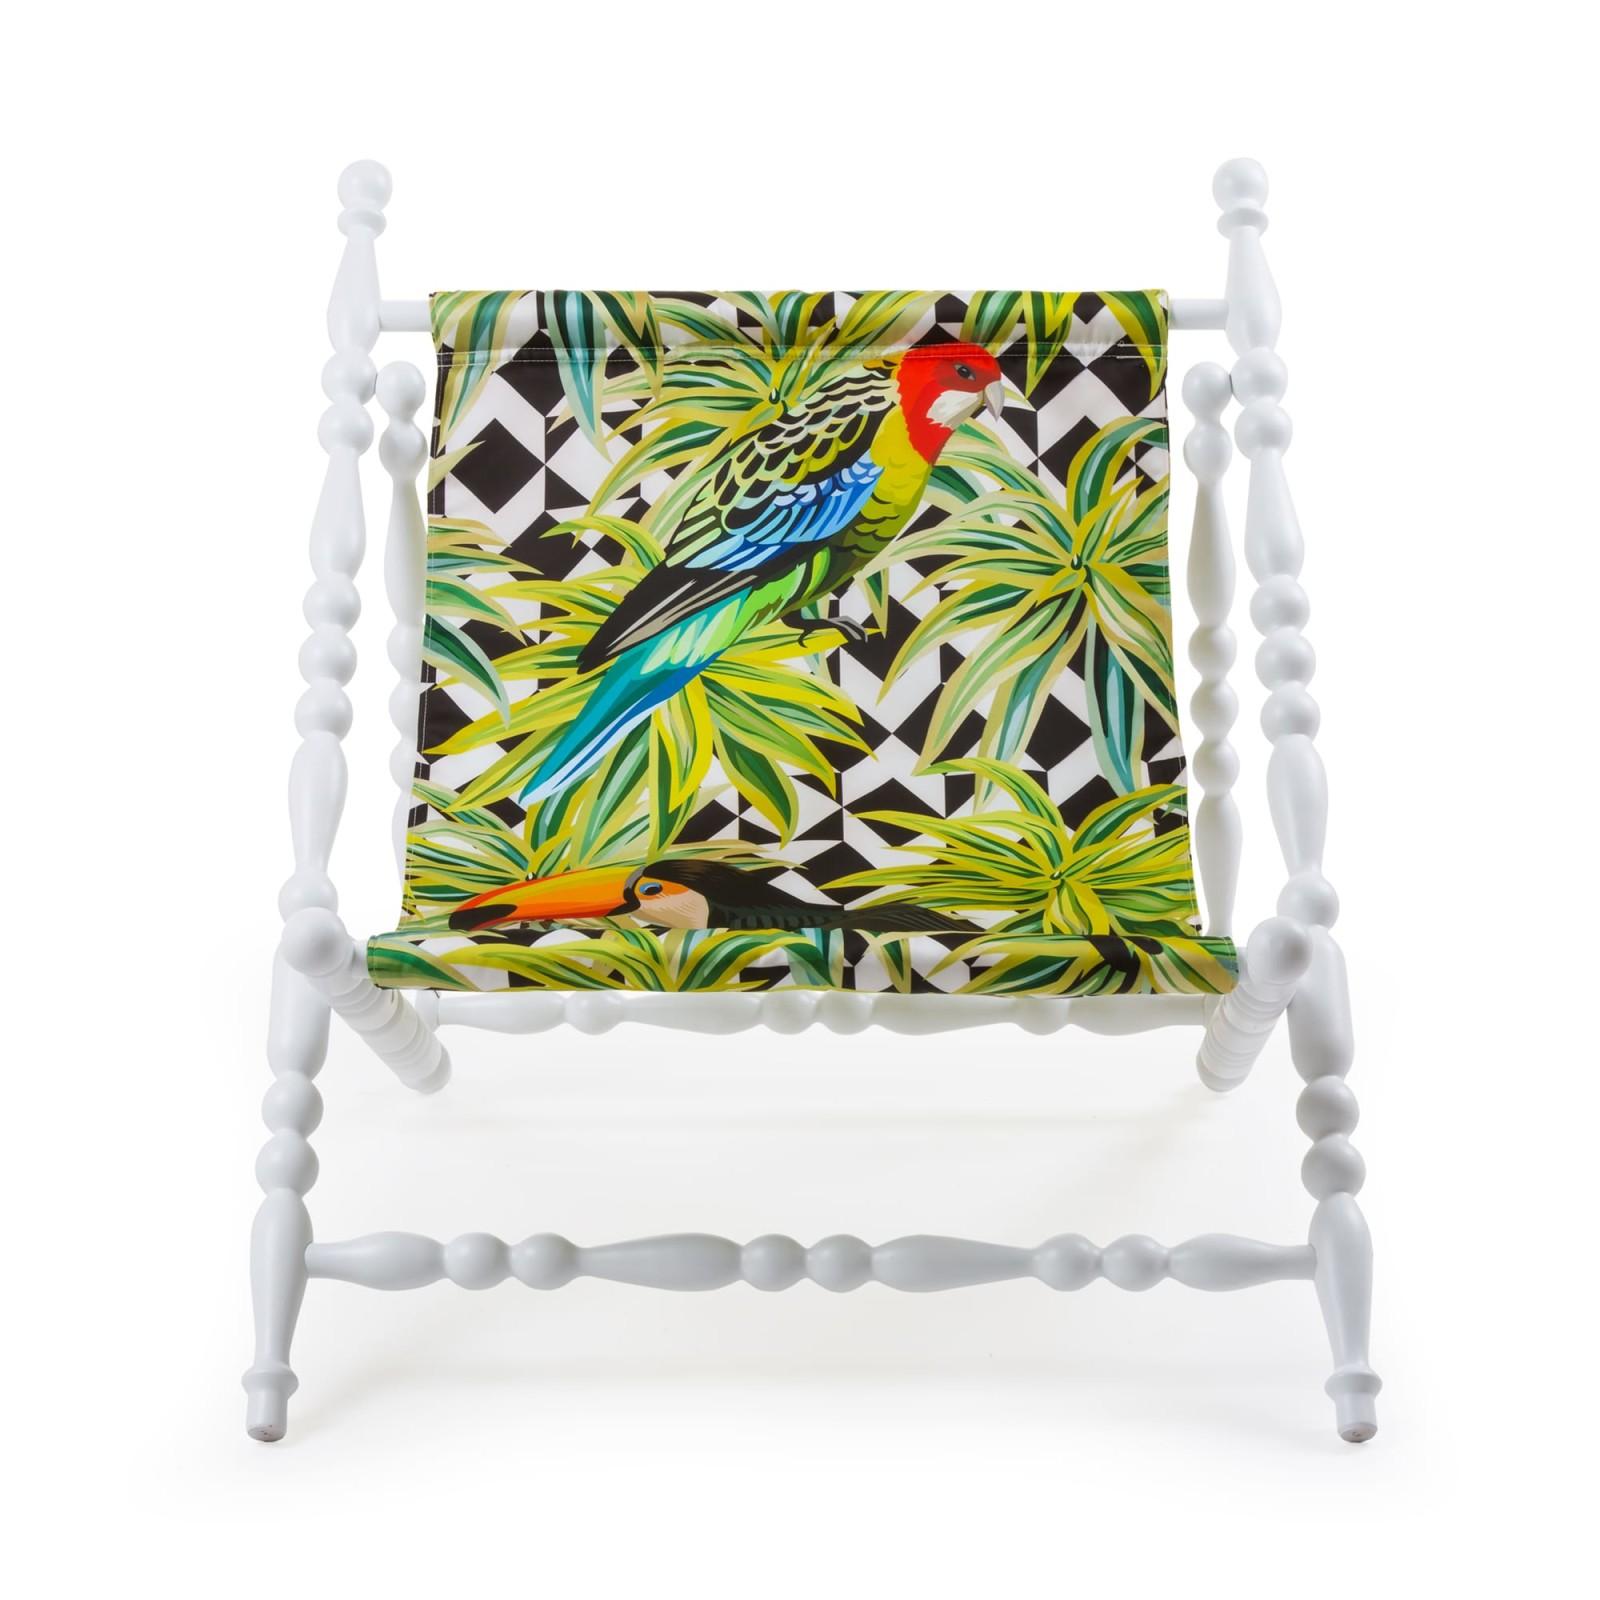 Heritage Foldable Deckchair - Set of 2 White base, Parrots